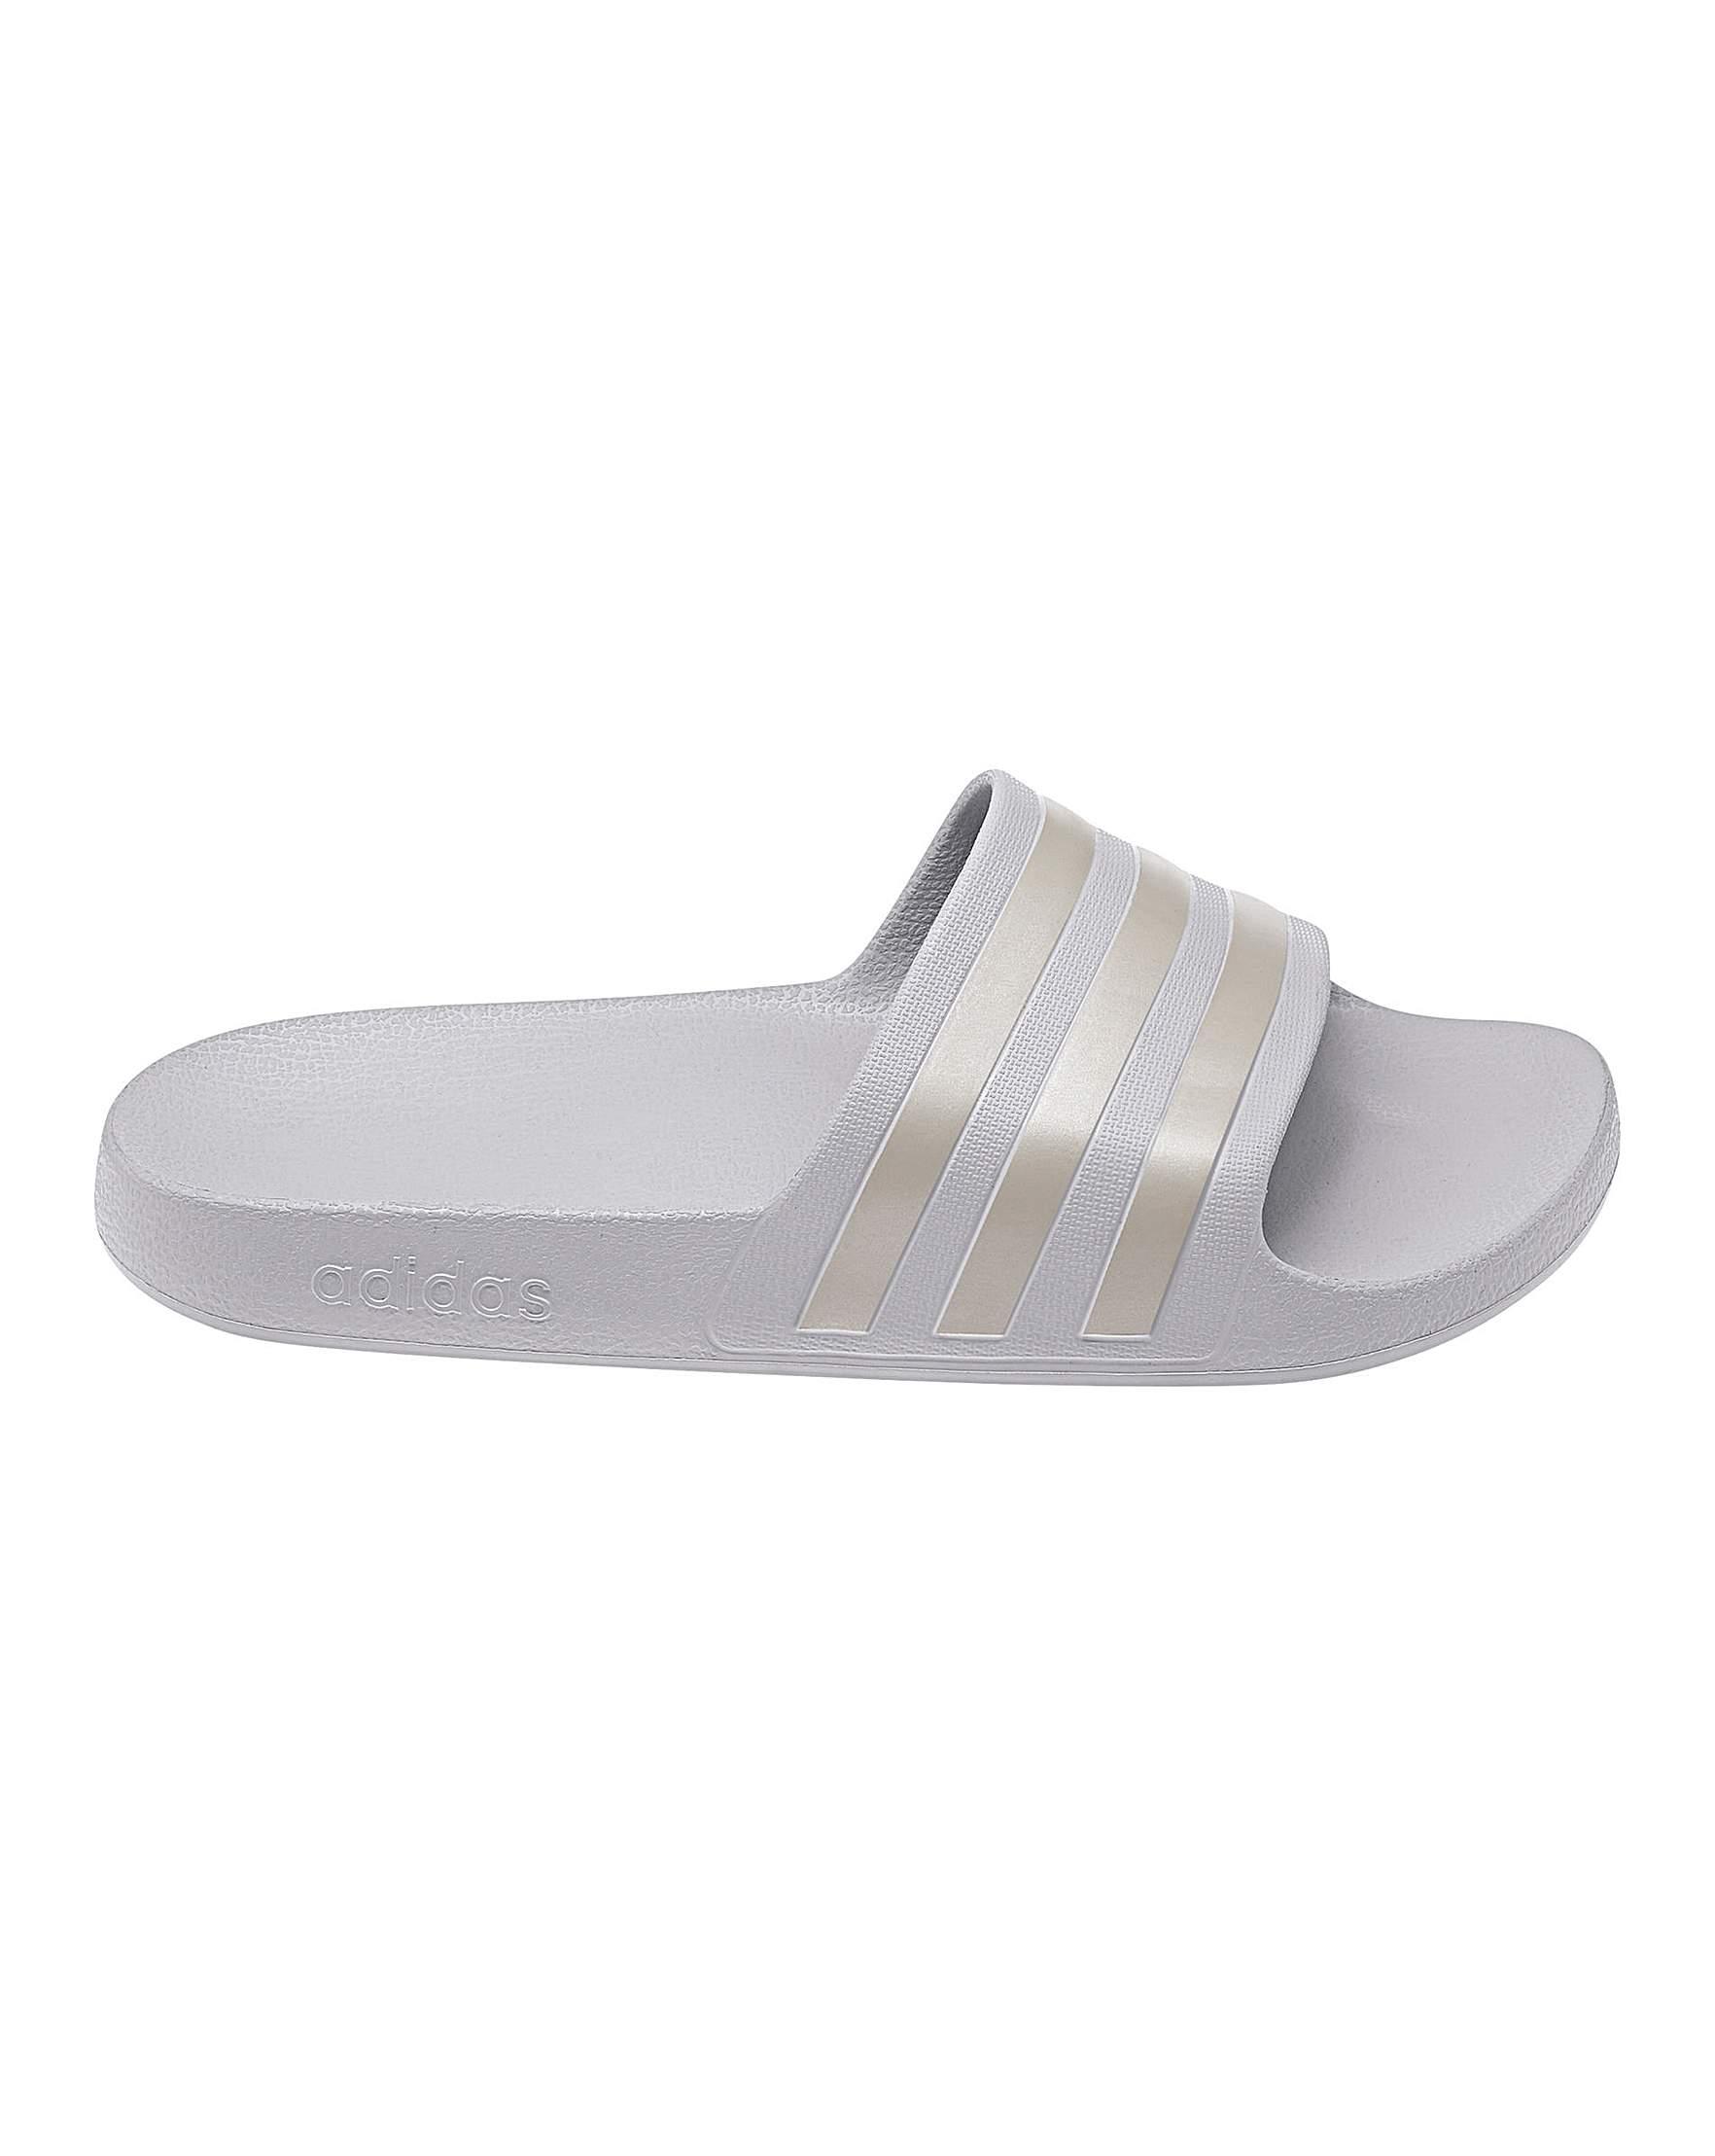 02fea86d5b6 adidas Adilette Aqua Sliders | Simply Be